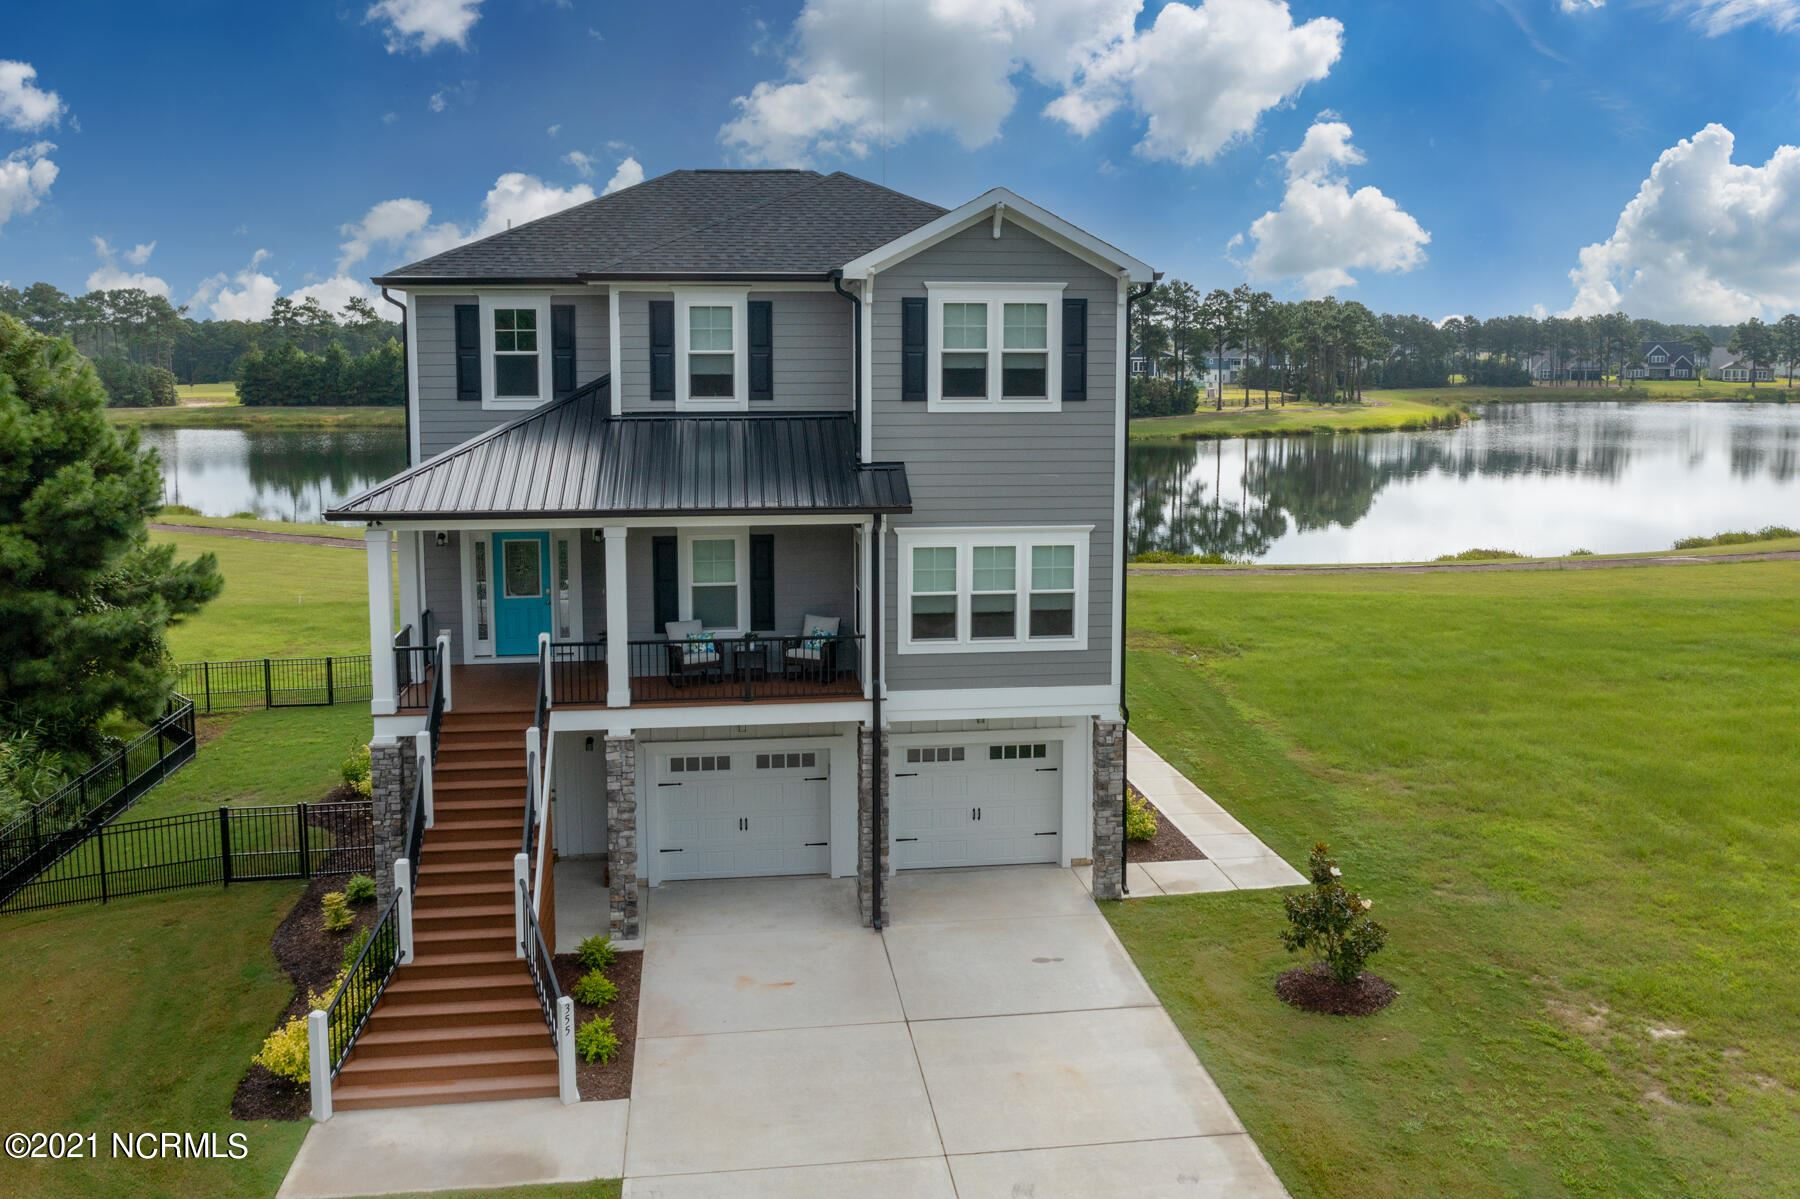 Photo of 355 Summerhouse Drive, Holly Ridge, NC 28445 (MLS # 100289641)